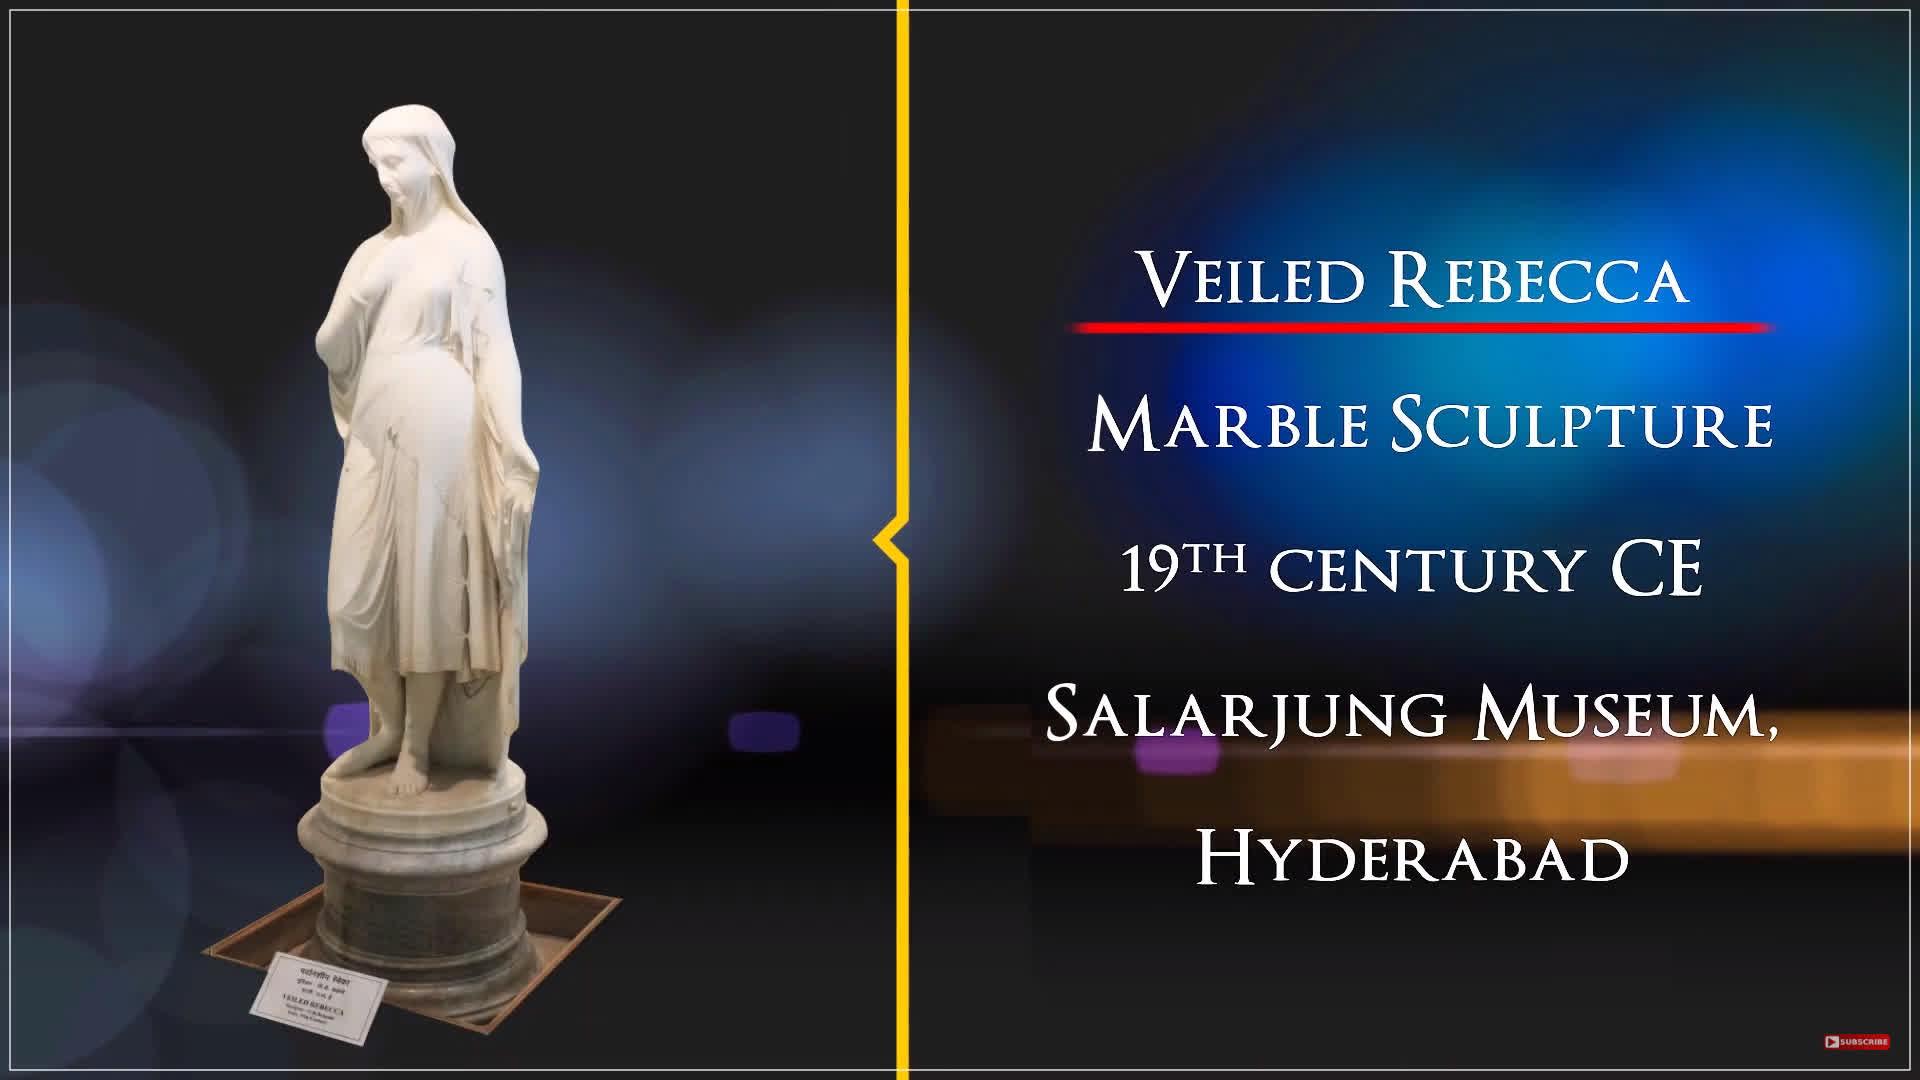 Veiled Rebecca | Treasures of India